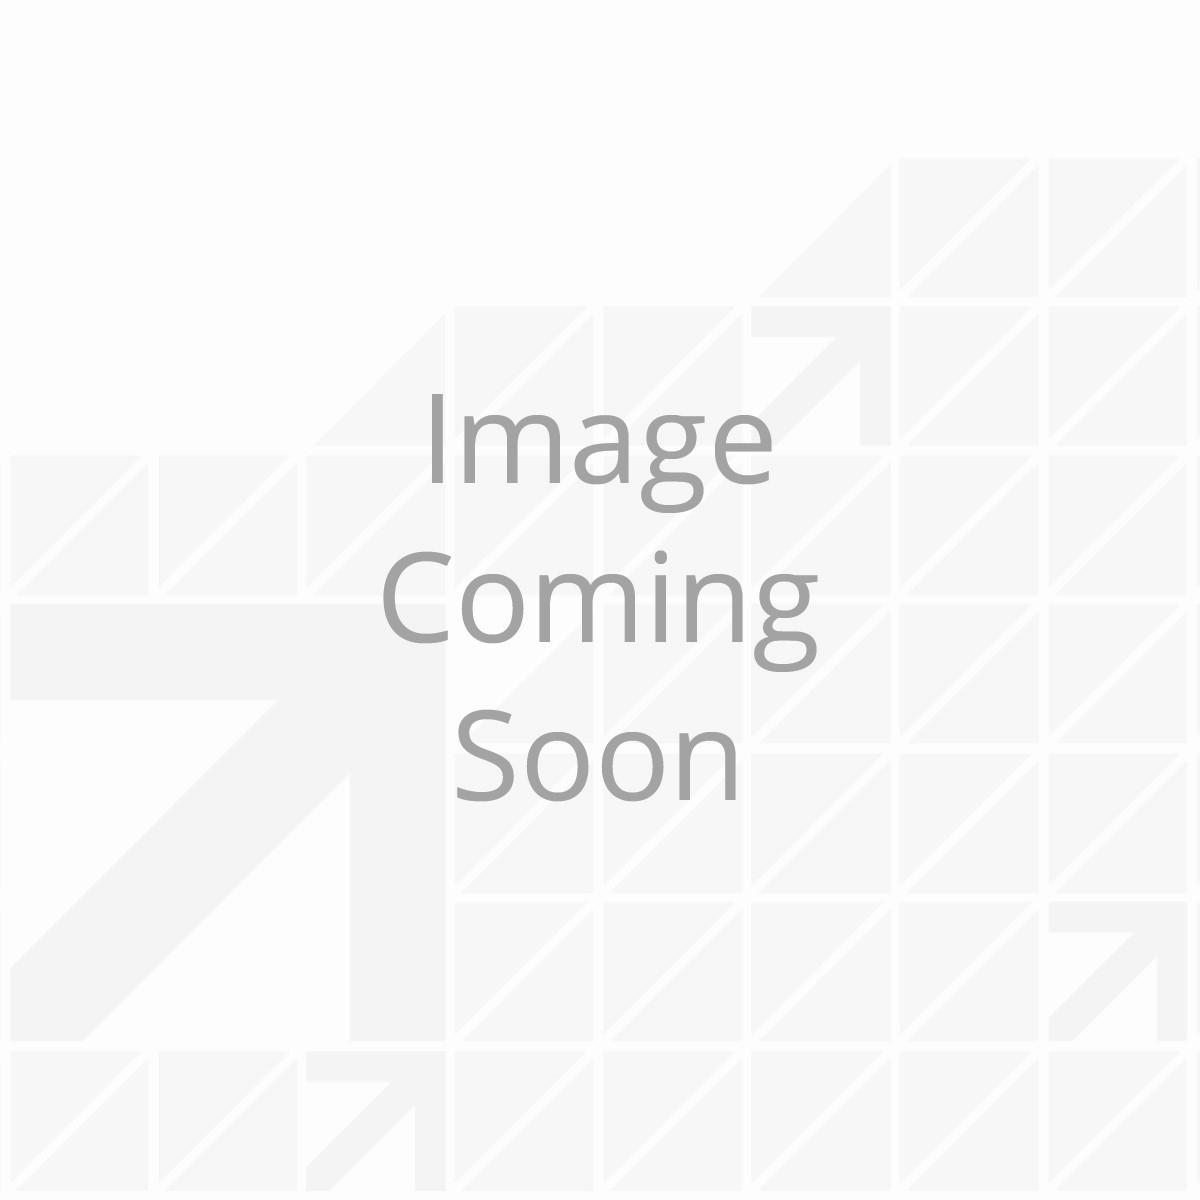 Hydraulic Fitting; Long Straight; 6400-L-04-04